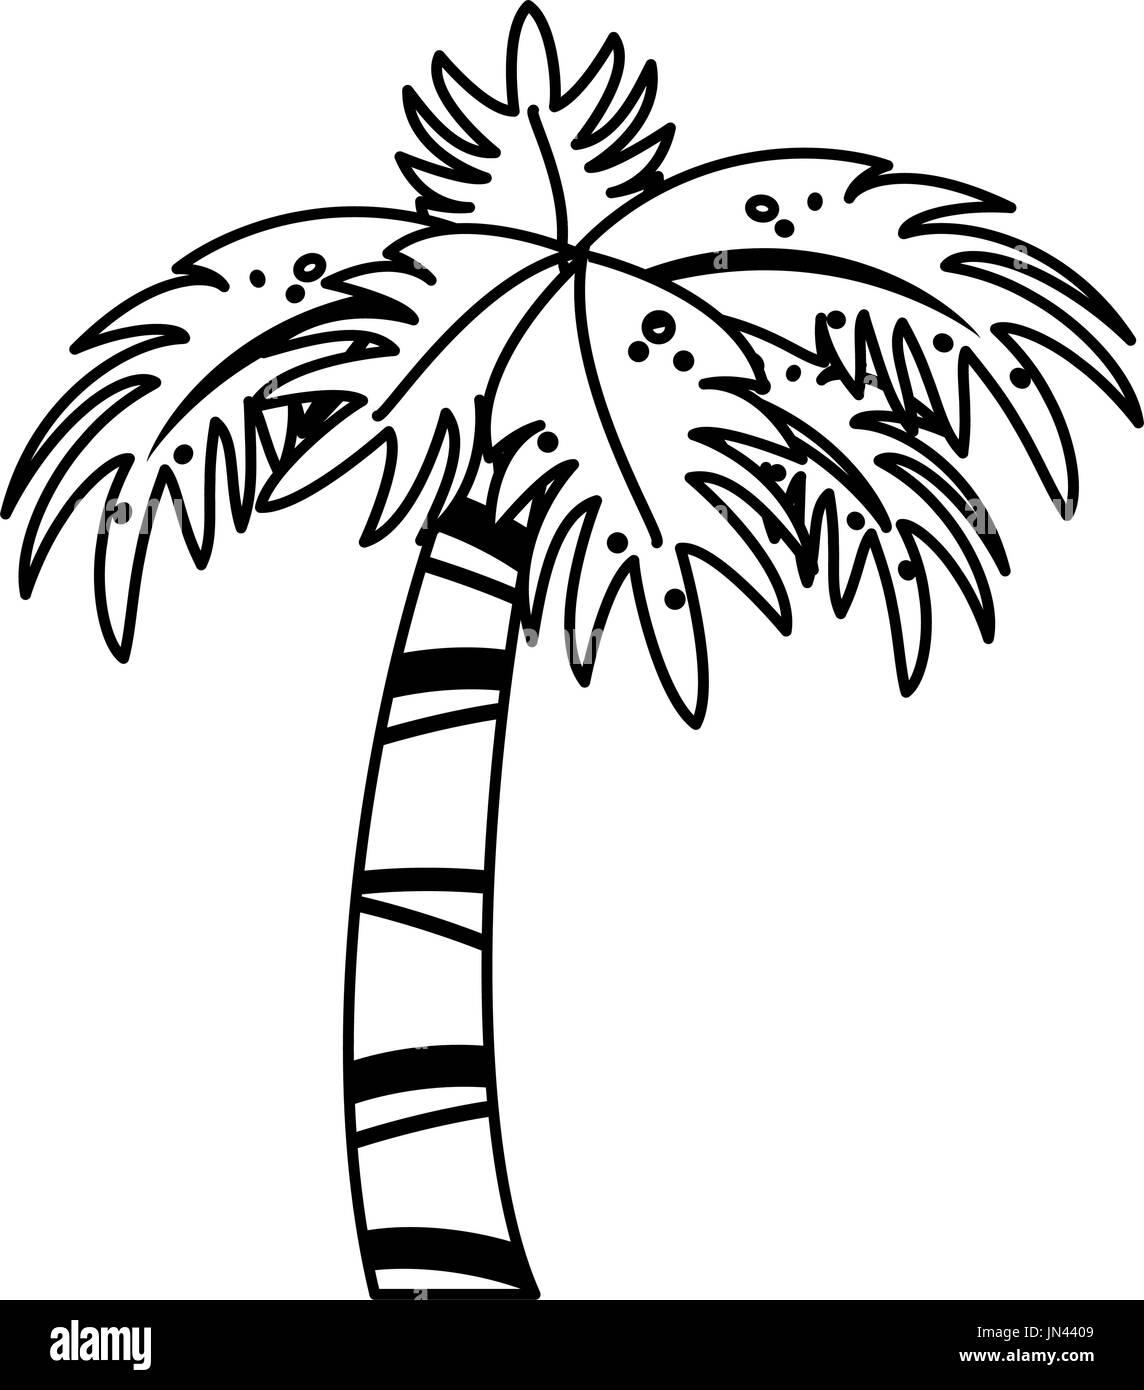 hight resolution of palm tree icon image stock image